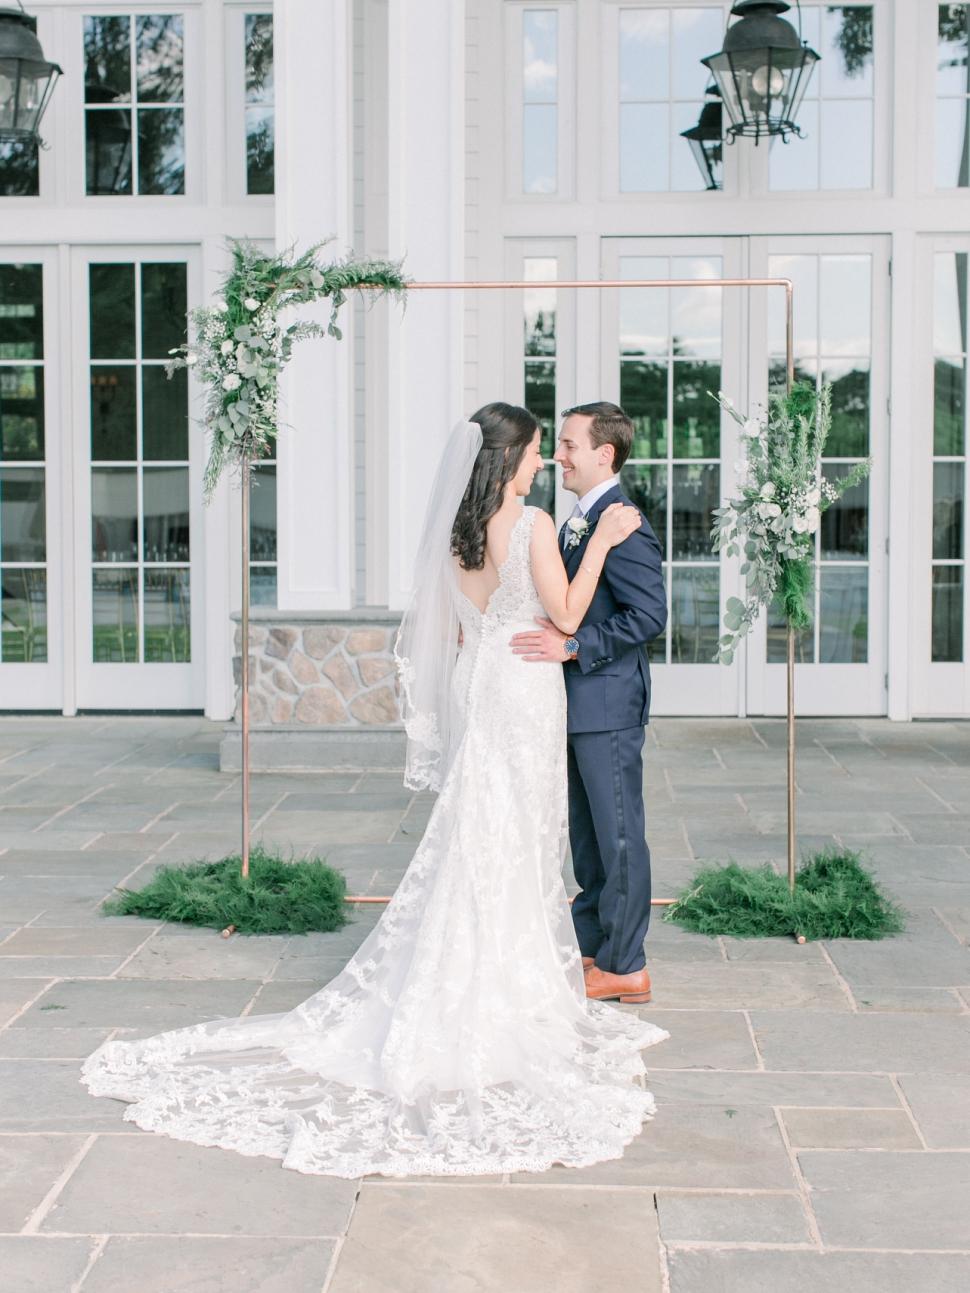 Ryland-Inn-Wedding-Photographer-Cassi-Claire_Ryland-Inn-Wedding_19.jpg